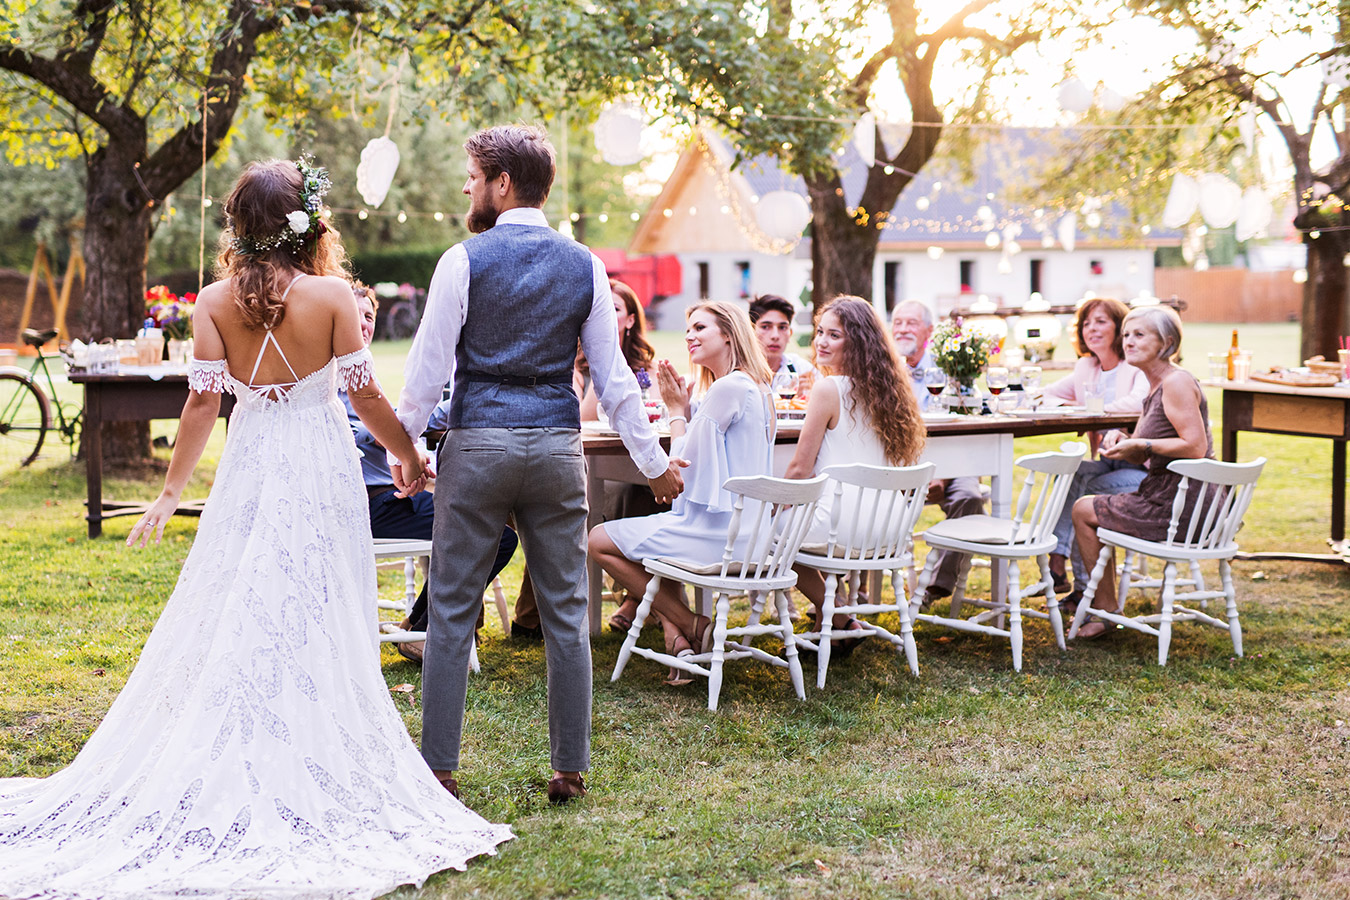 18 Casual Wedding Ideas in 18   Zazzle Ideas